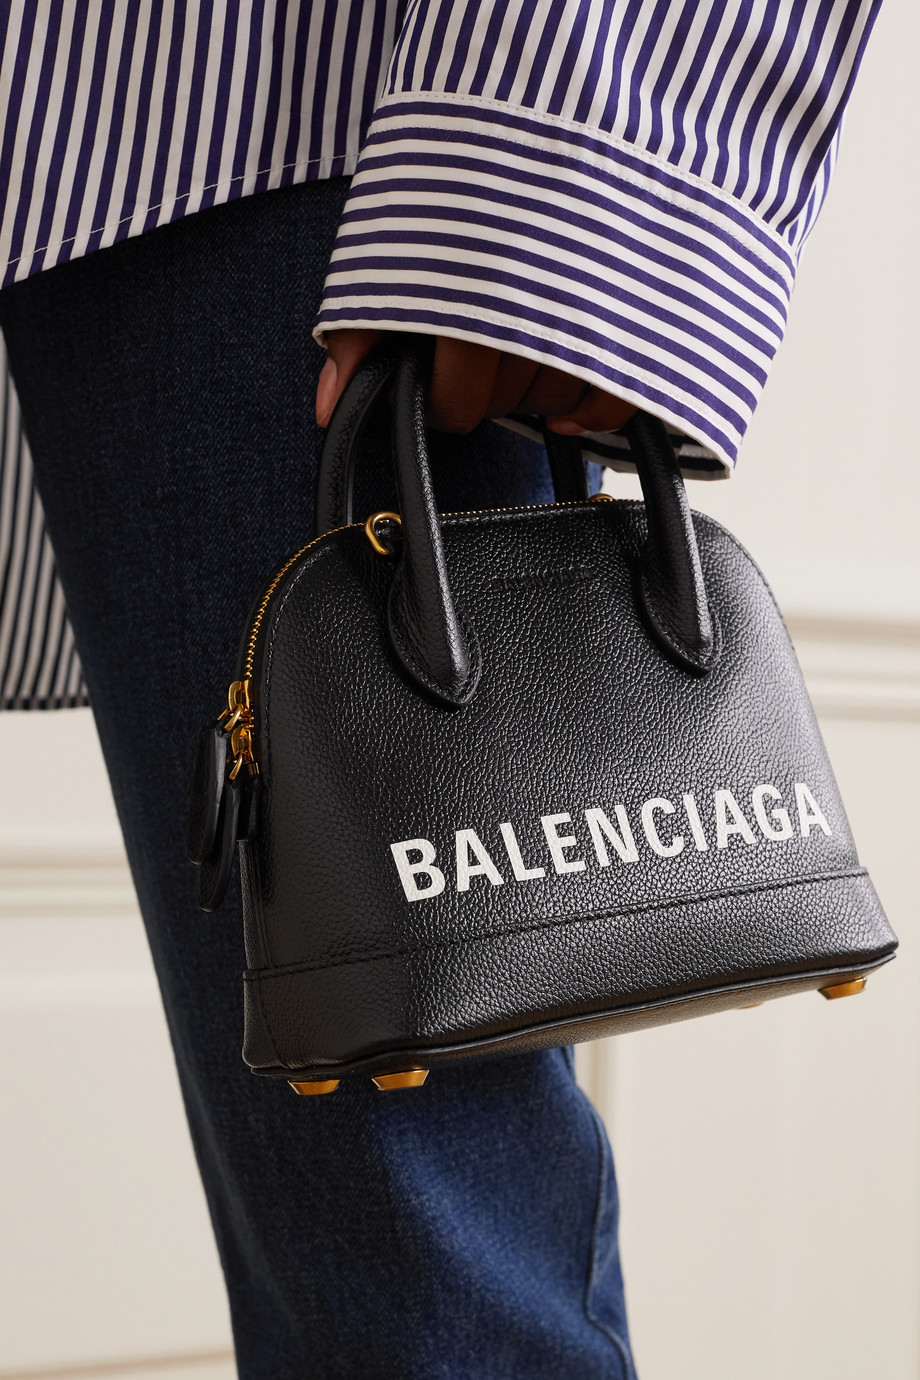 Balenciaga Sac à main en cuir texturé imprimé Ville XXS